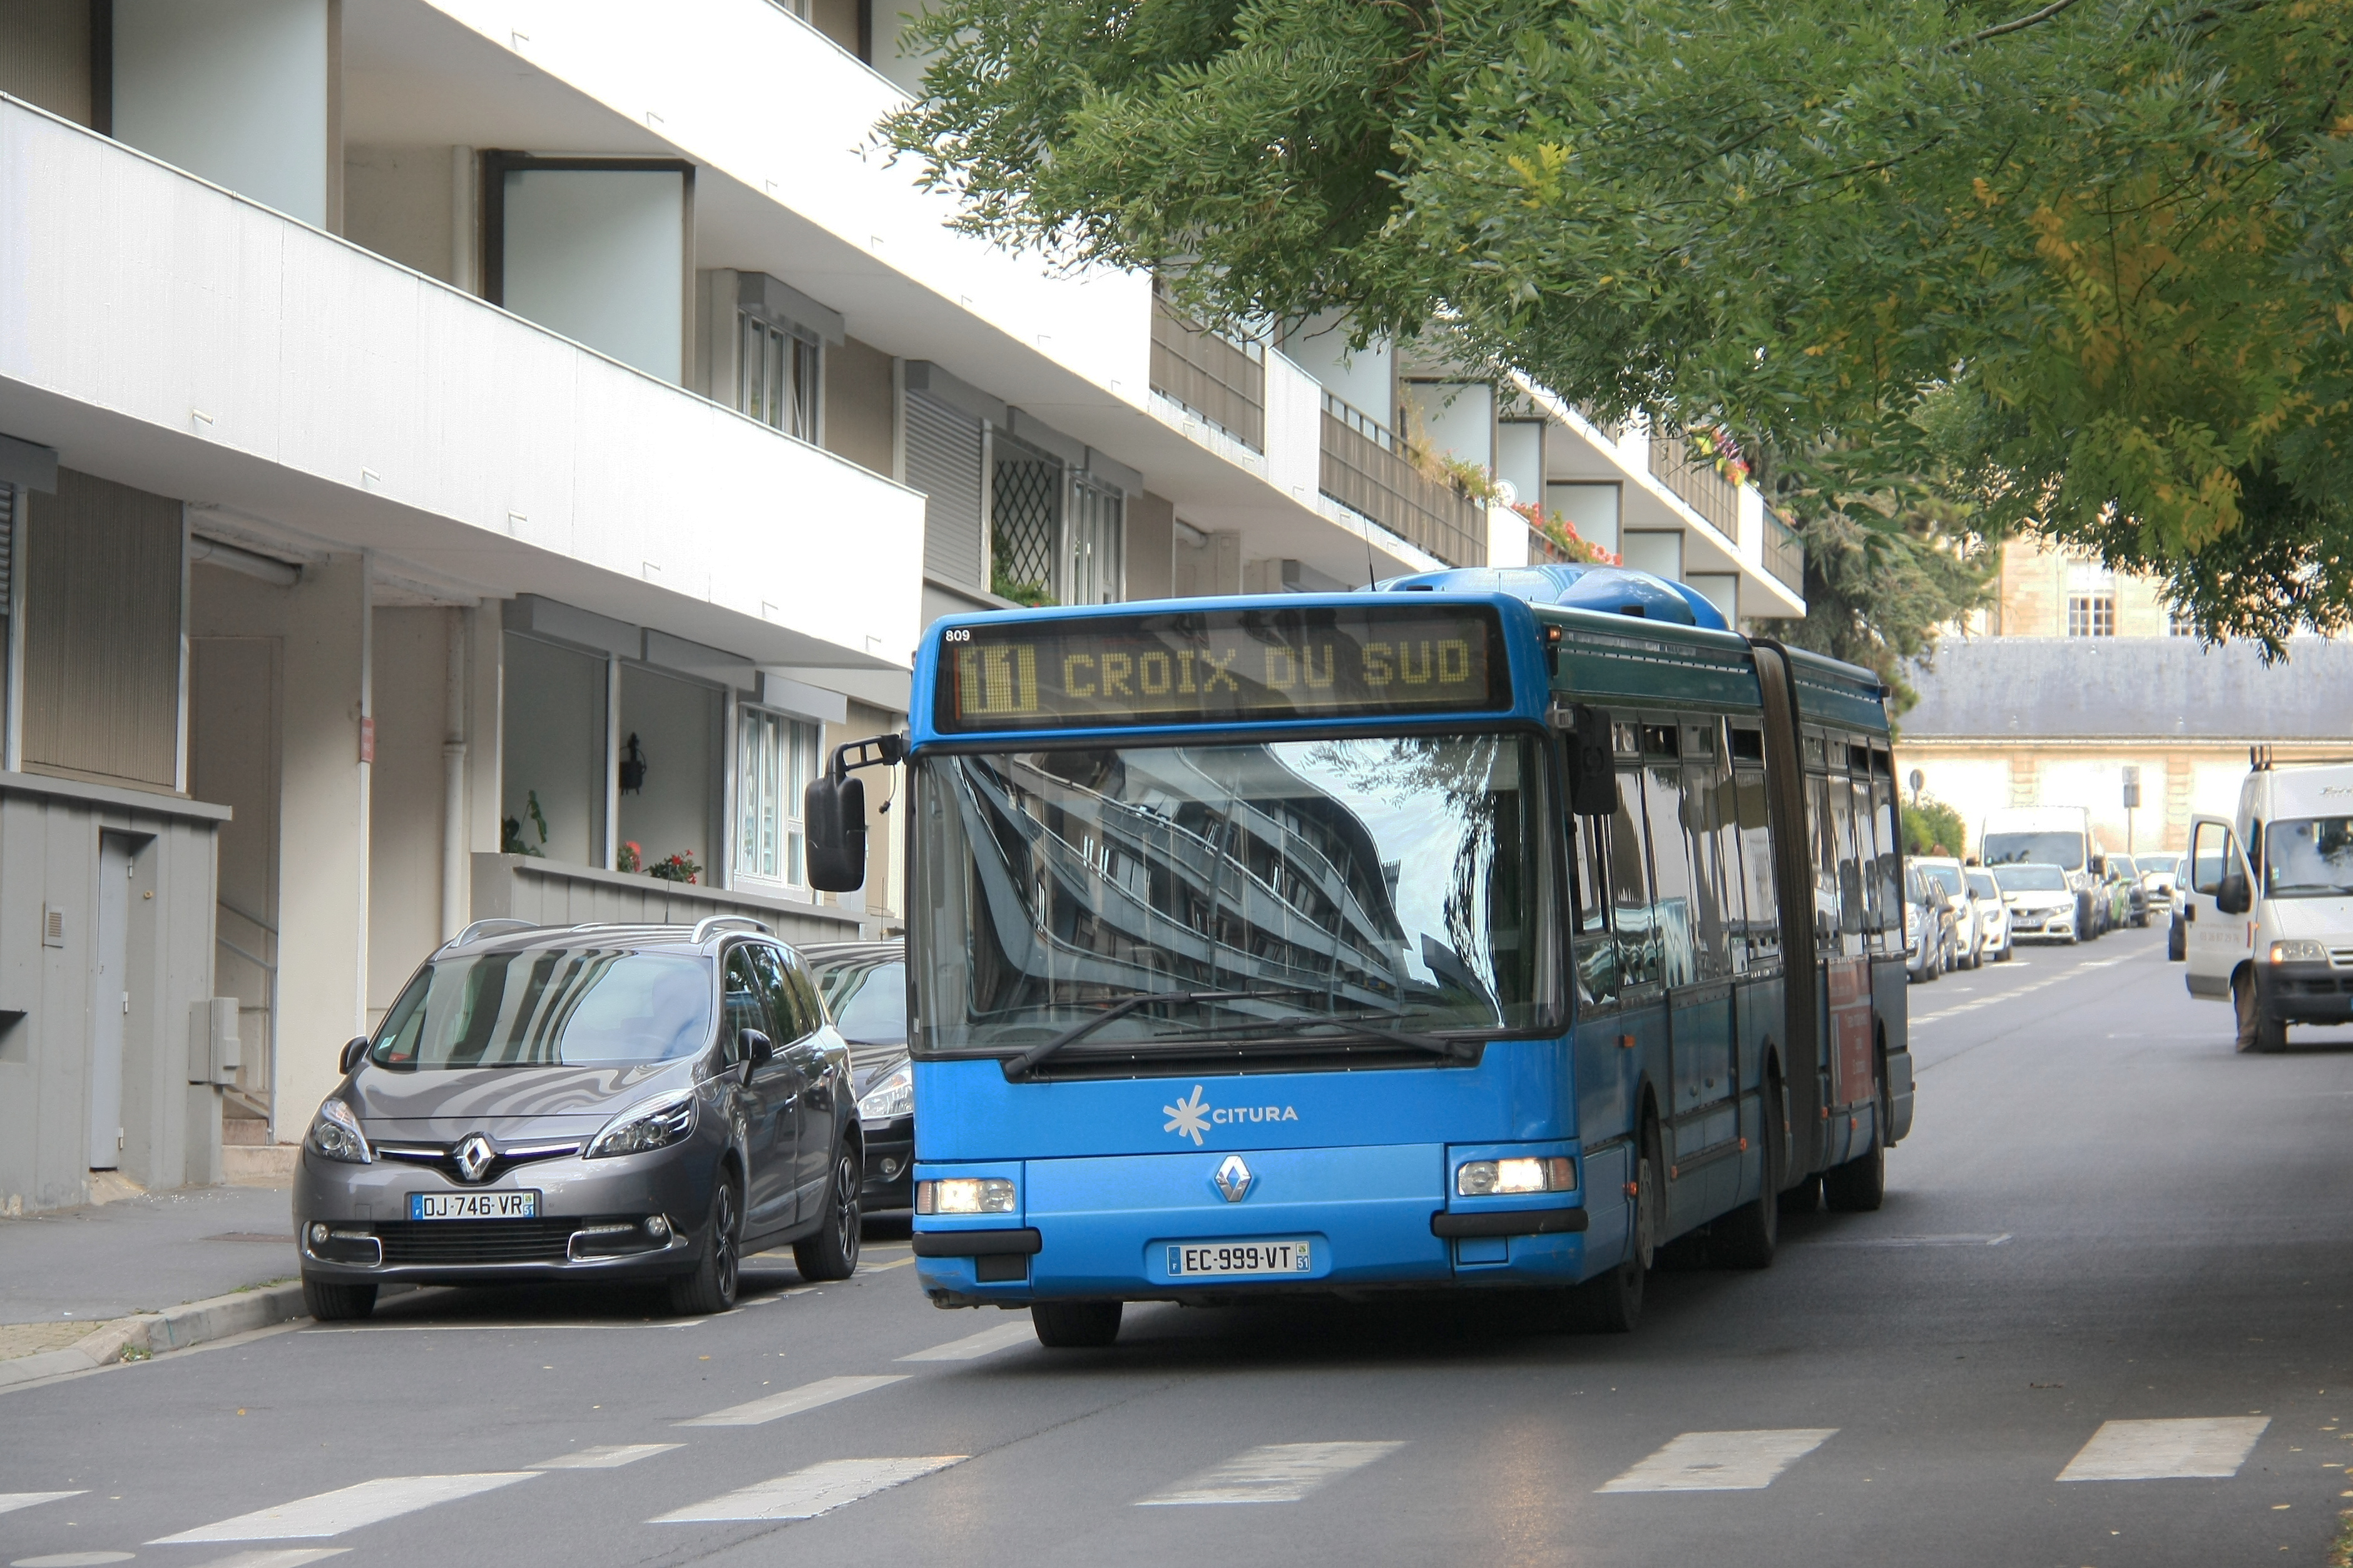 Free photo: CITURA - Renault Agora L n°809 - Ligne 11 - Windshield